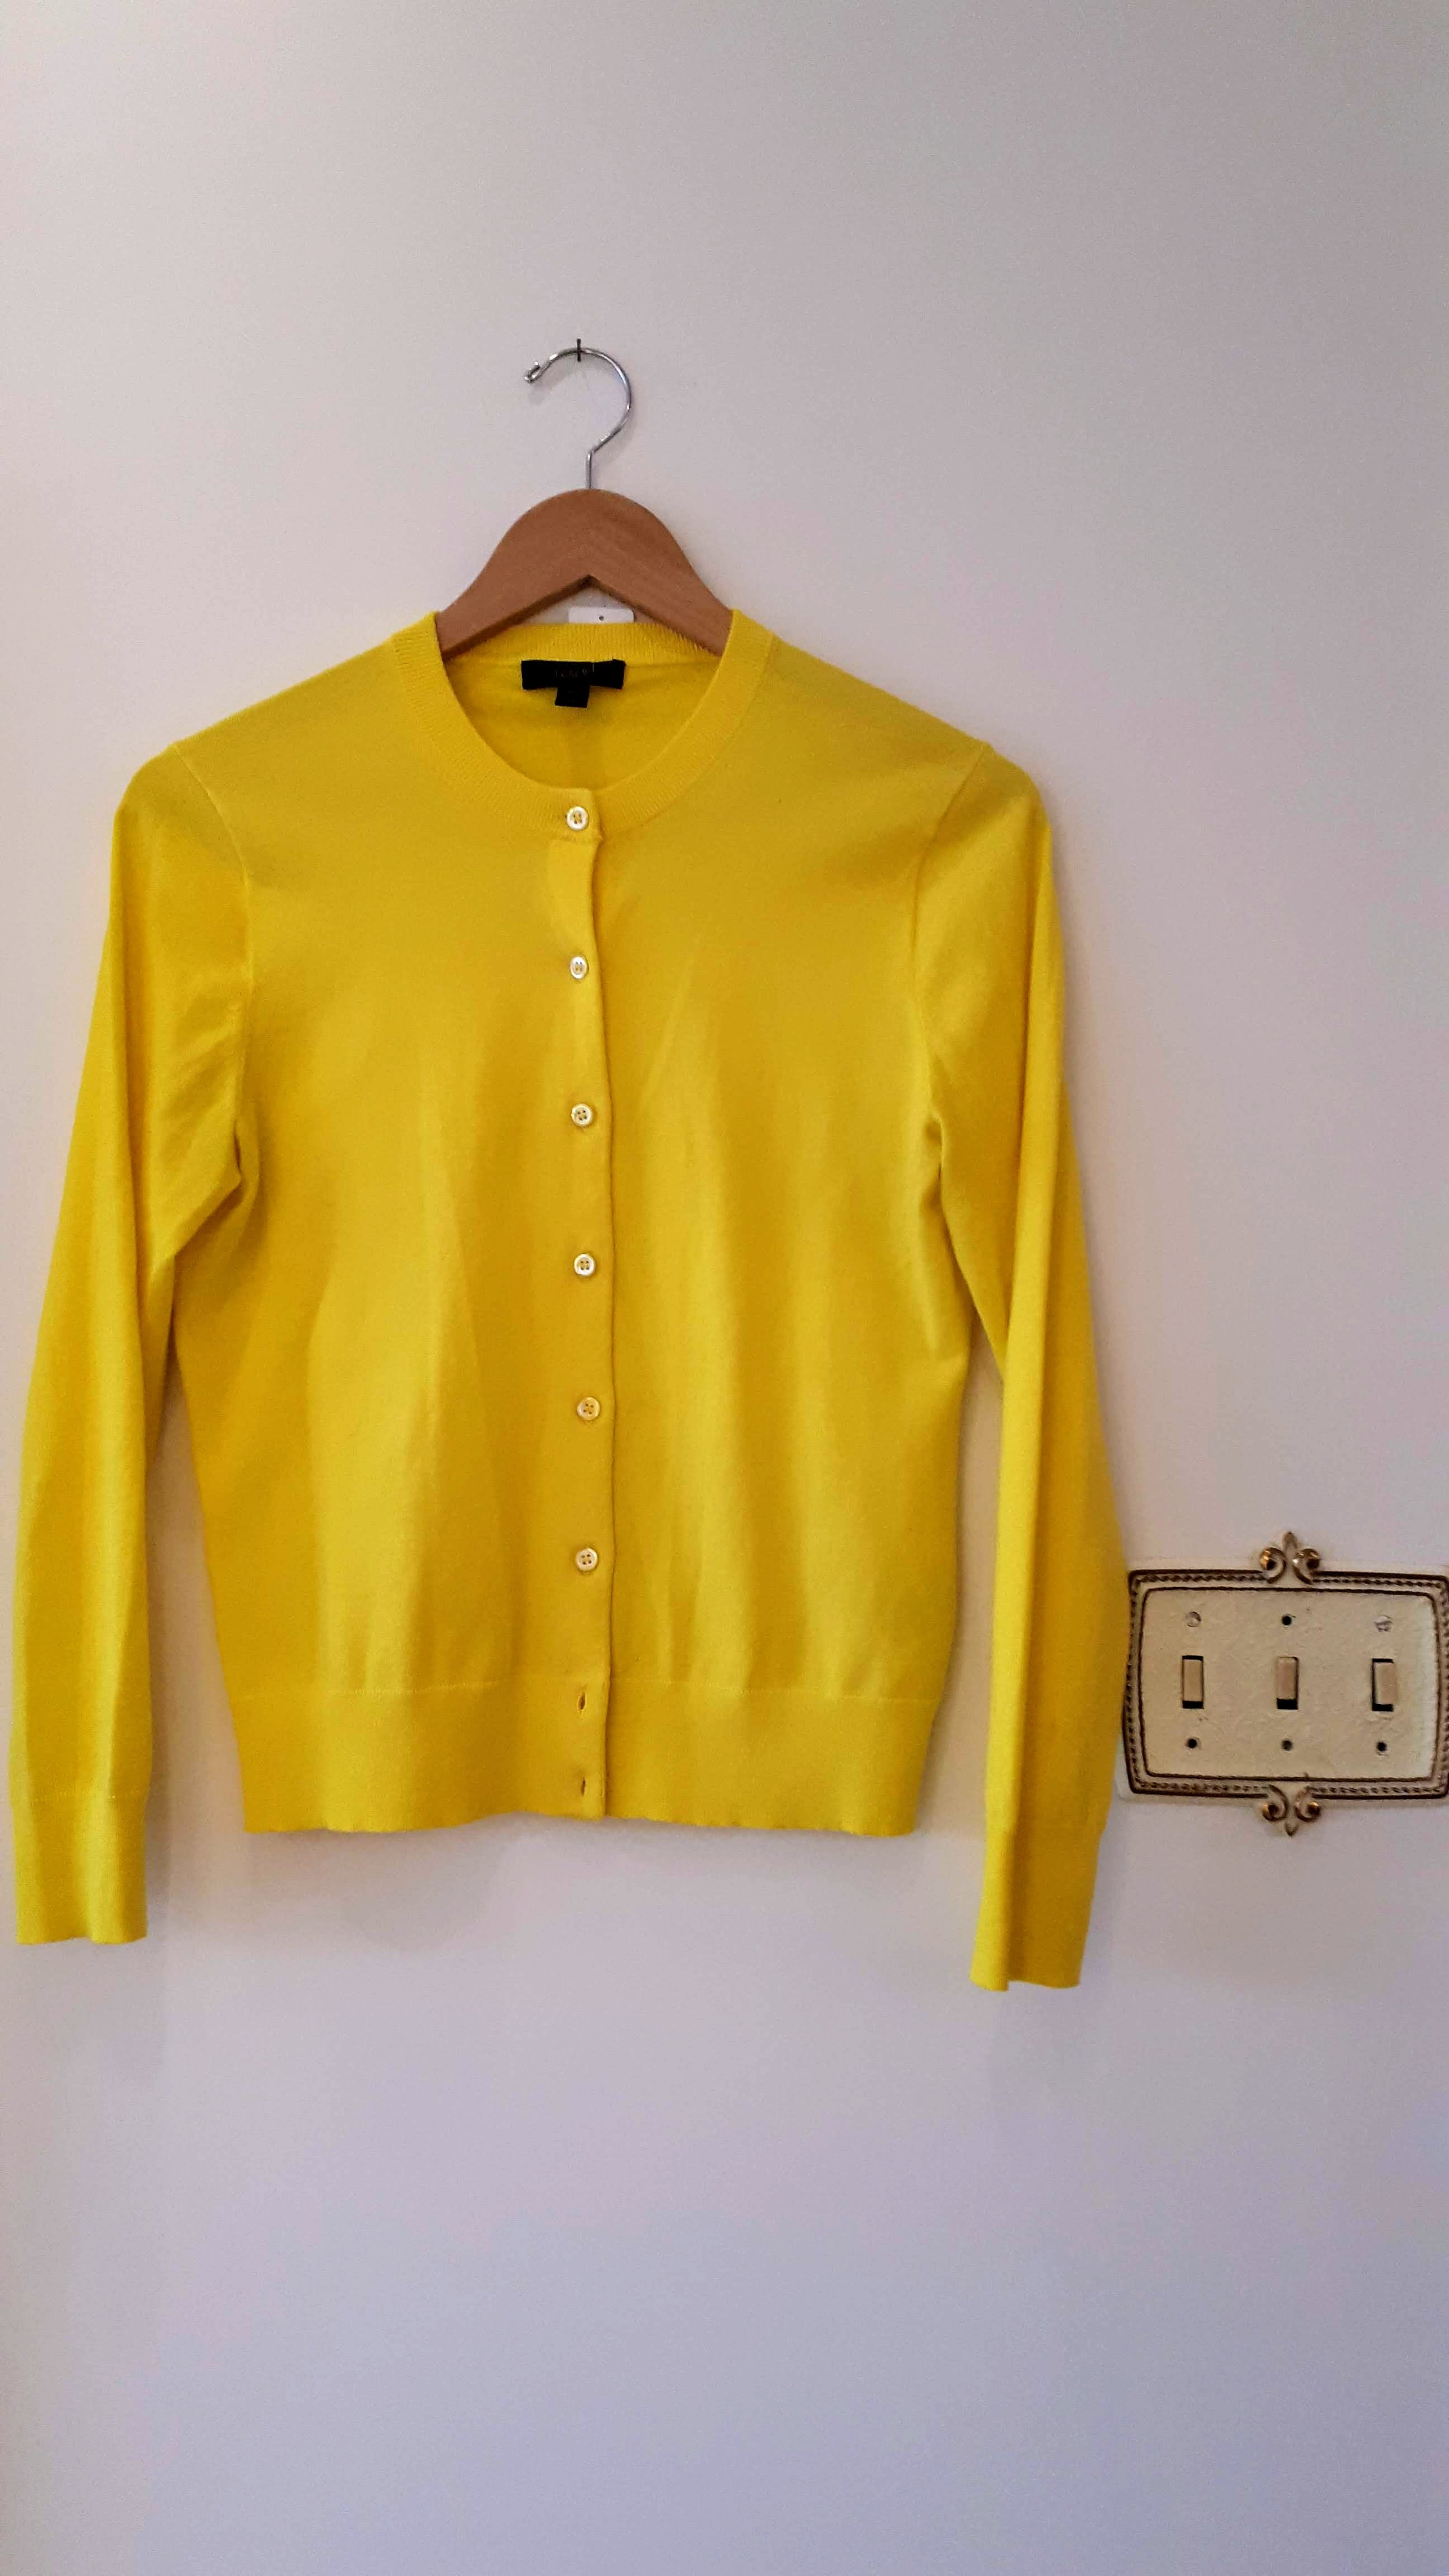 J Crew sweater; Size M, $28